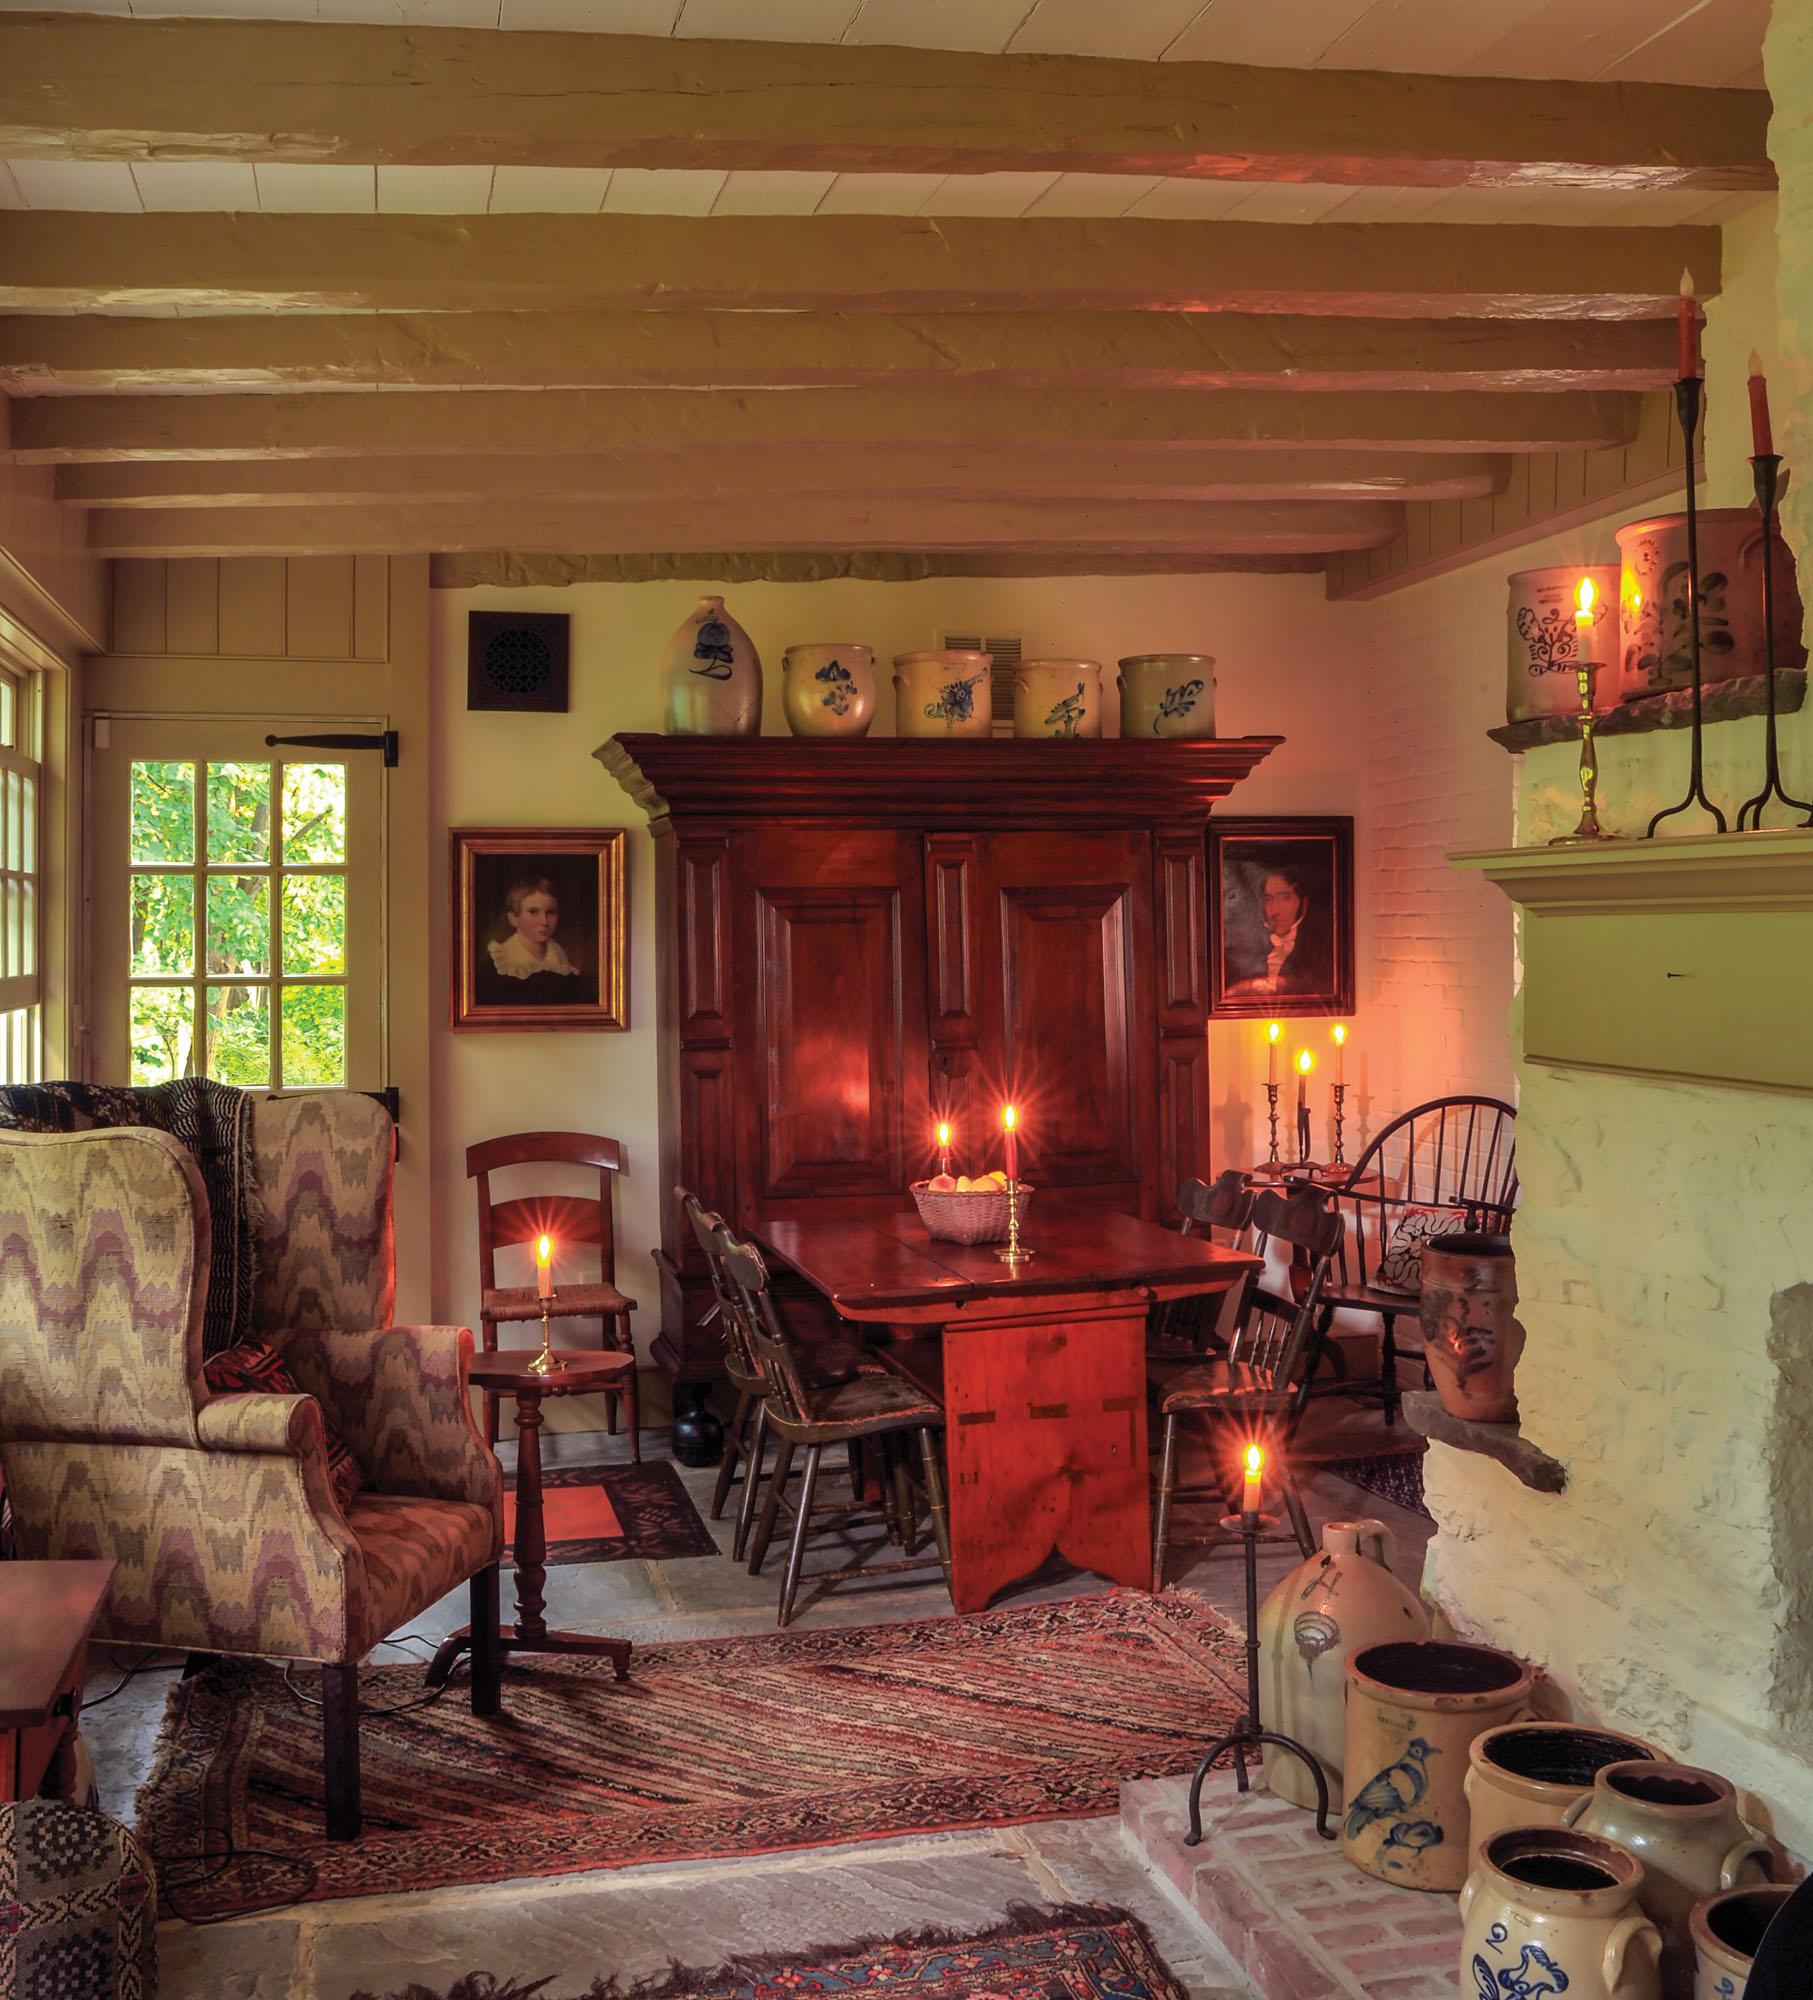 Colonial-era dining room